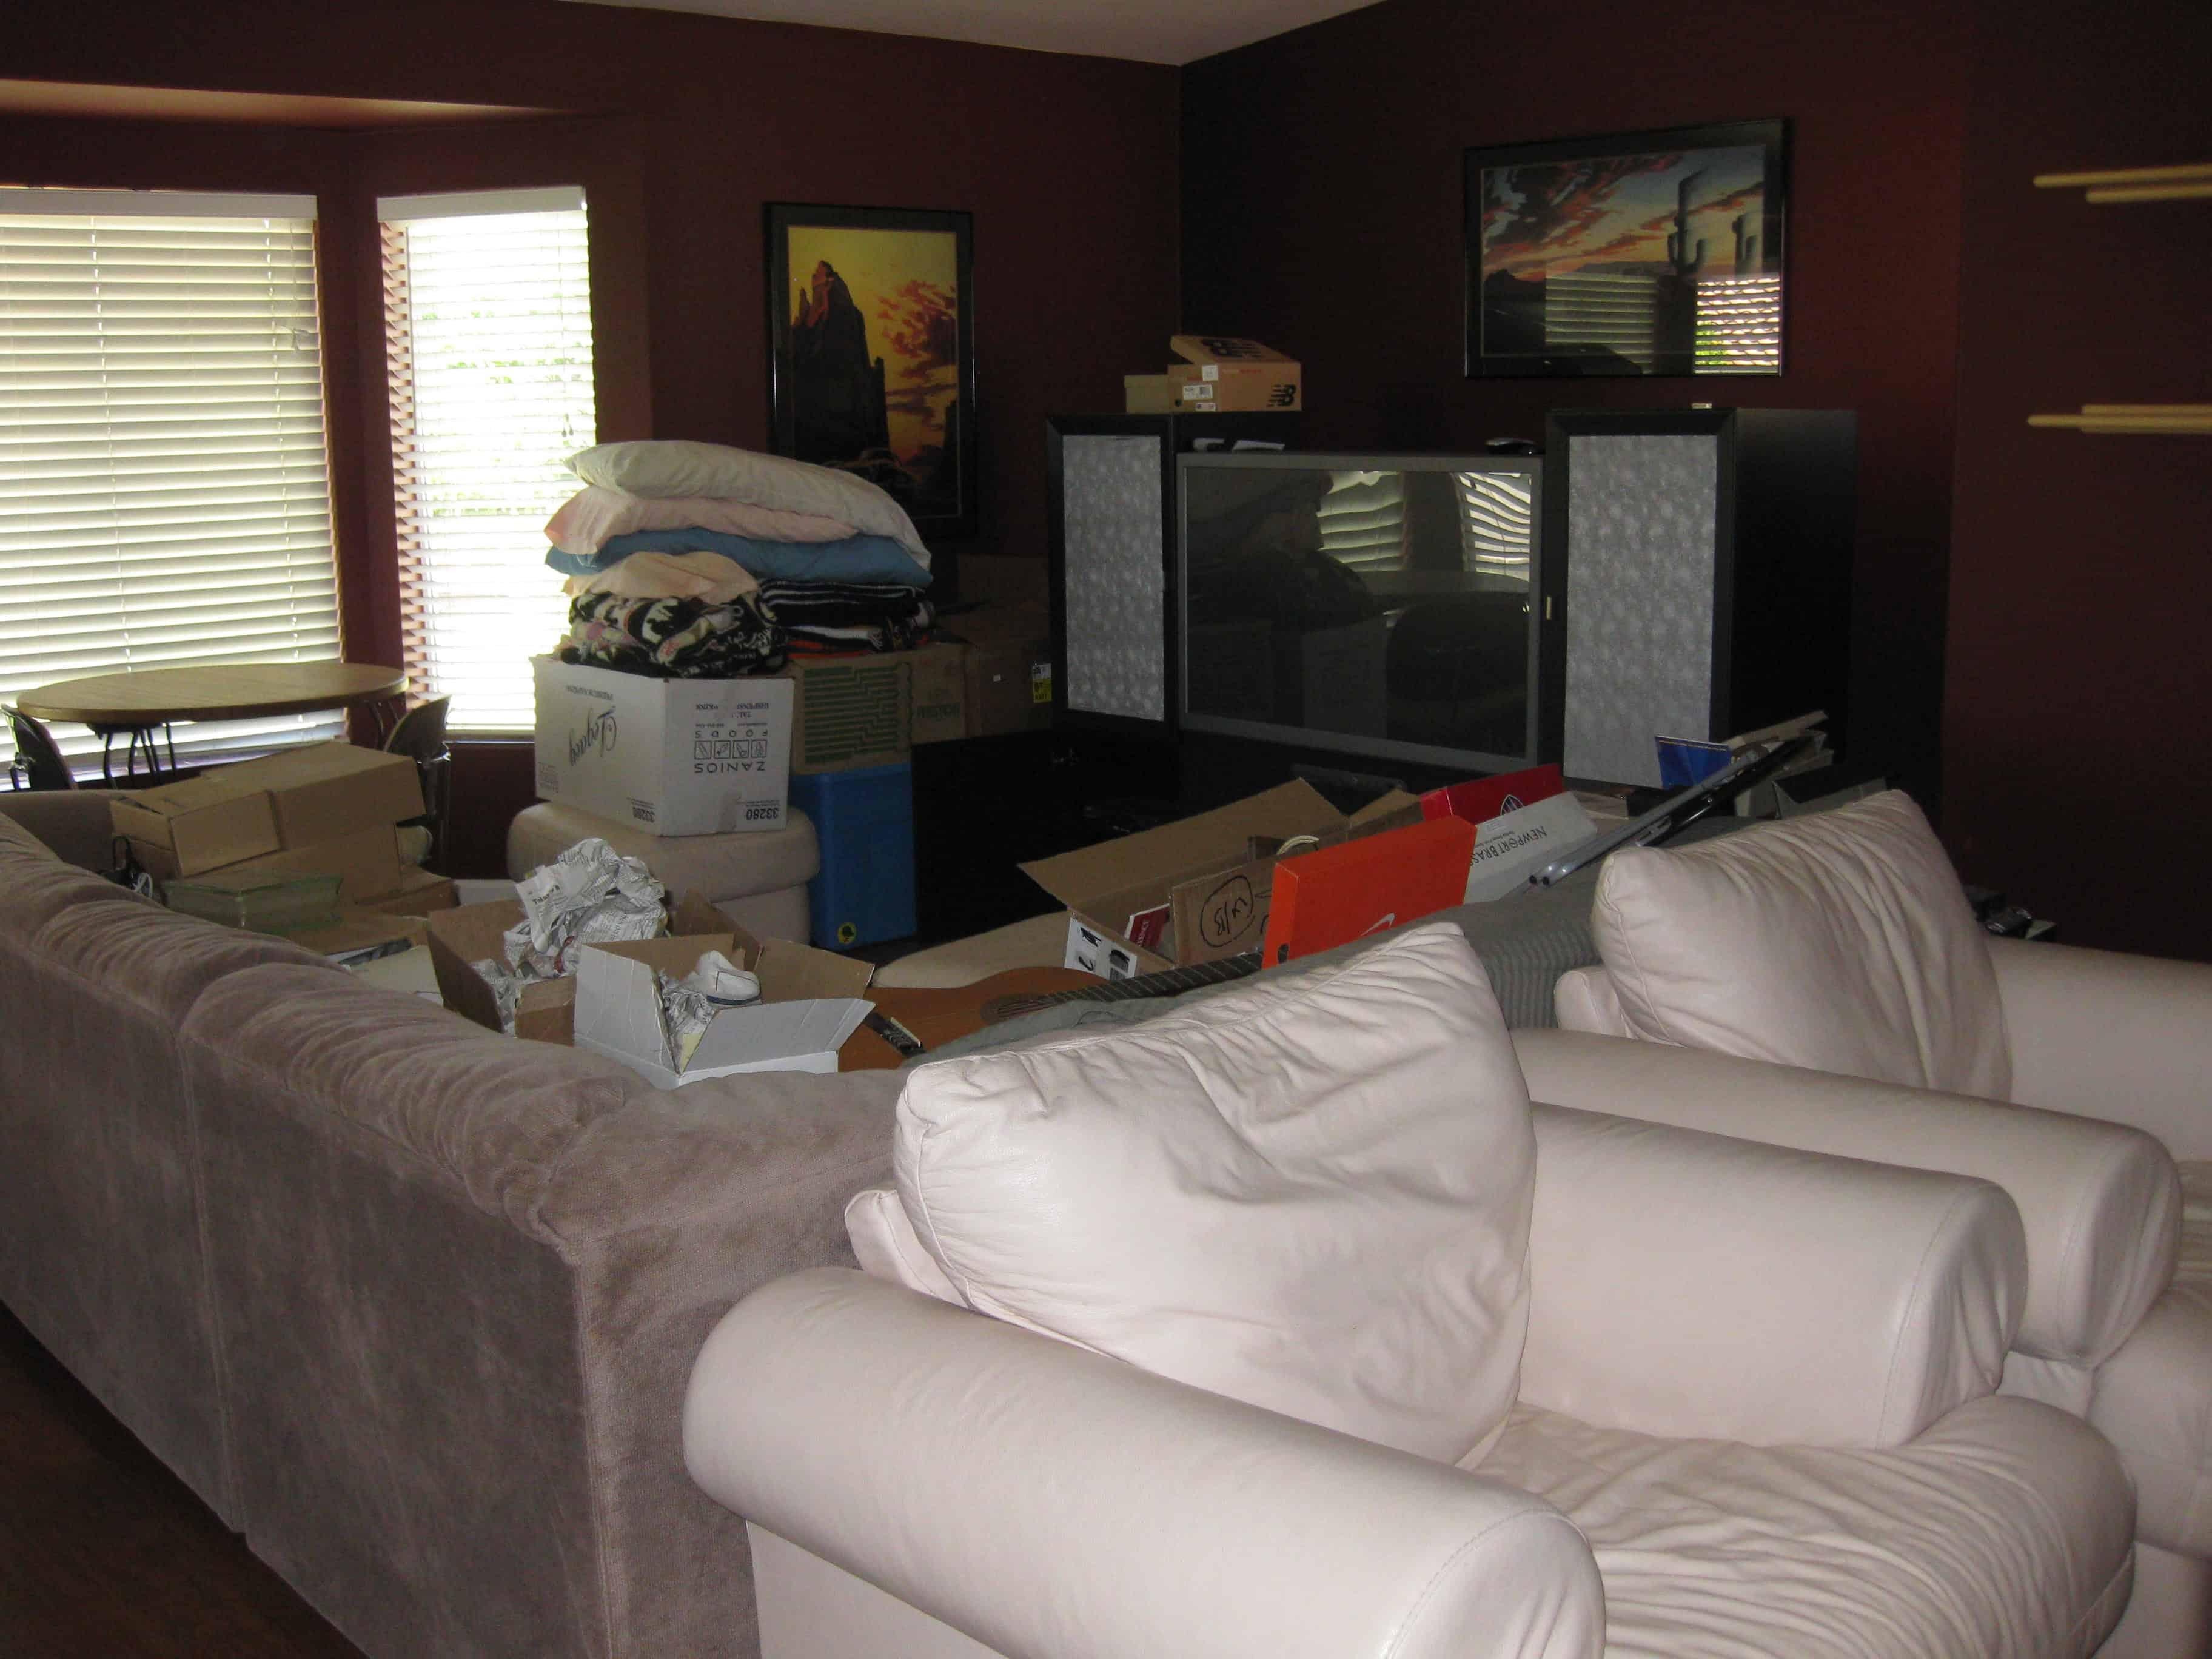 Unorganized living room